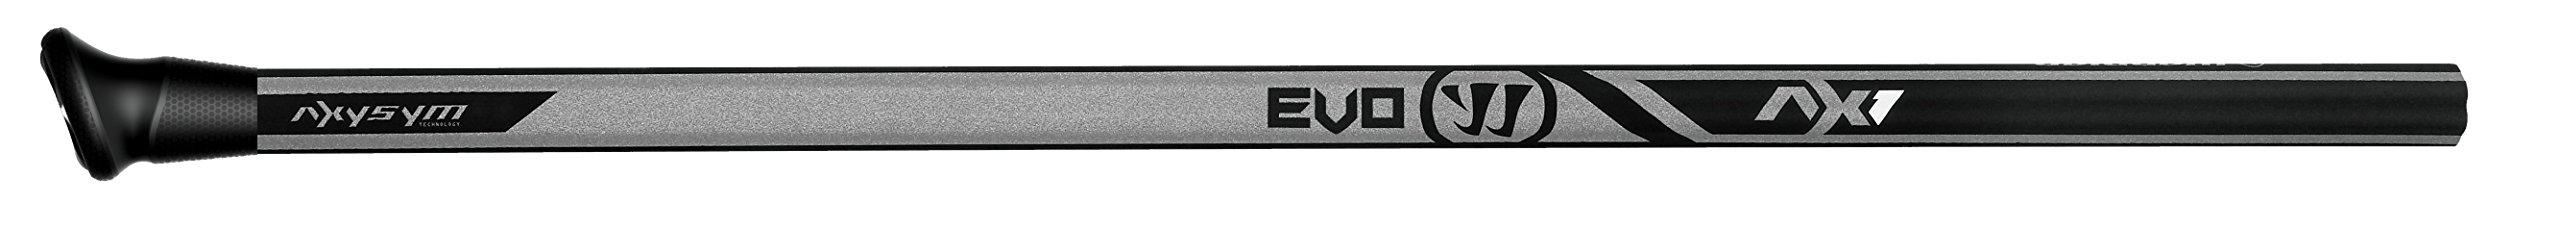 Warrior Evo AX1 Composite Attack Handle Lacrose Shaft, Black